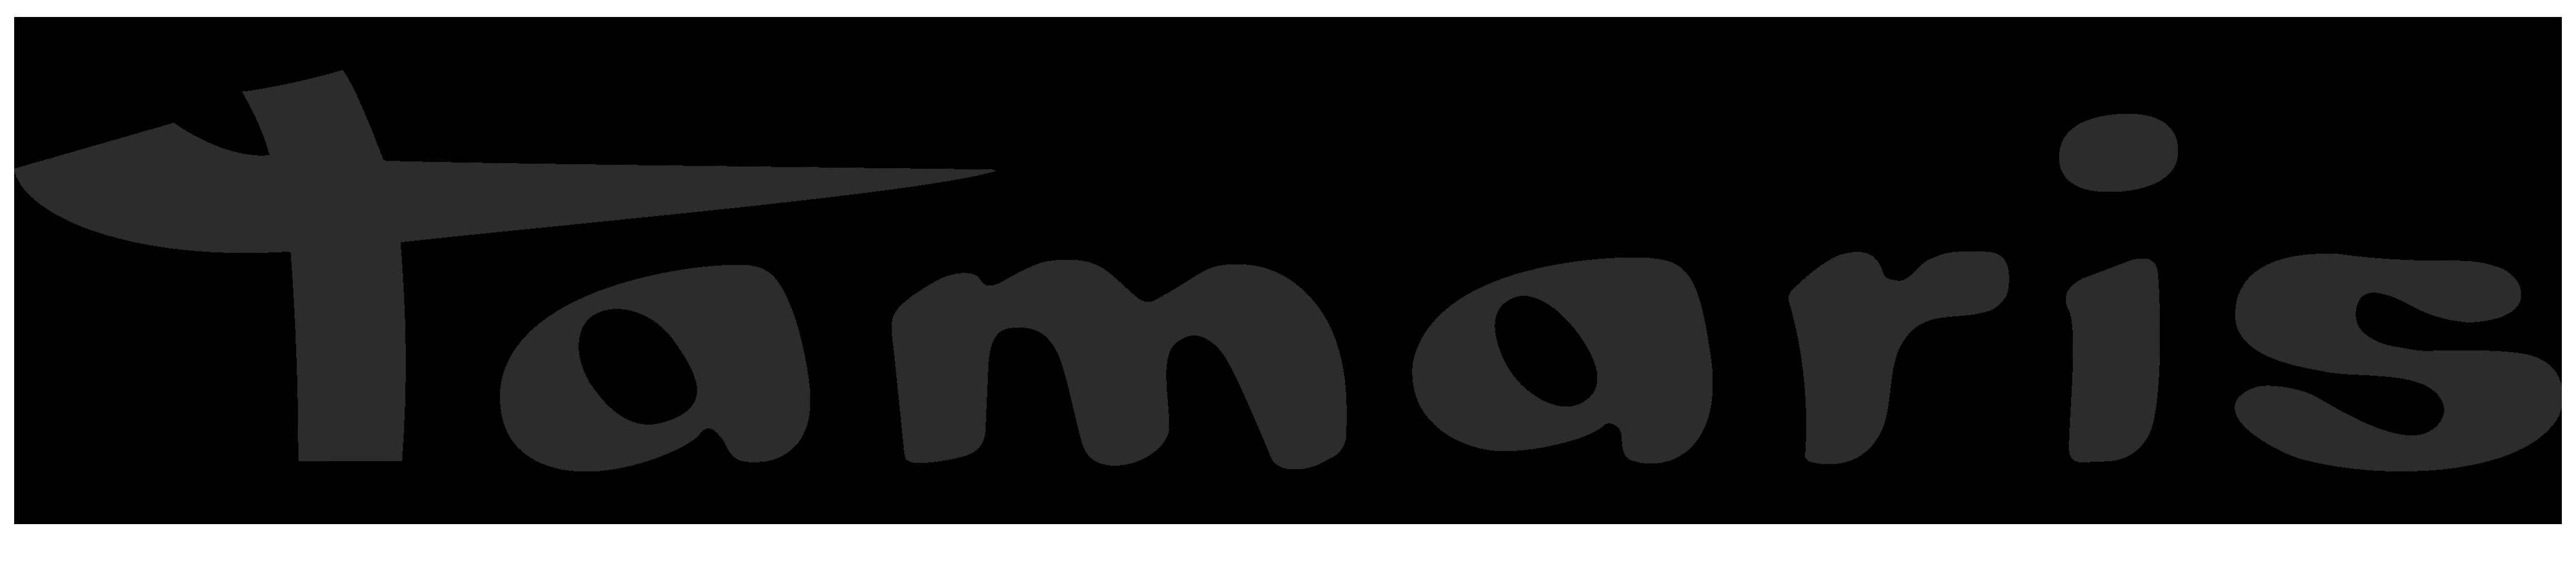 Home Design Creator Free Tamaris Logos Download